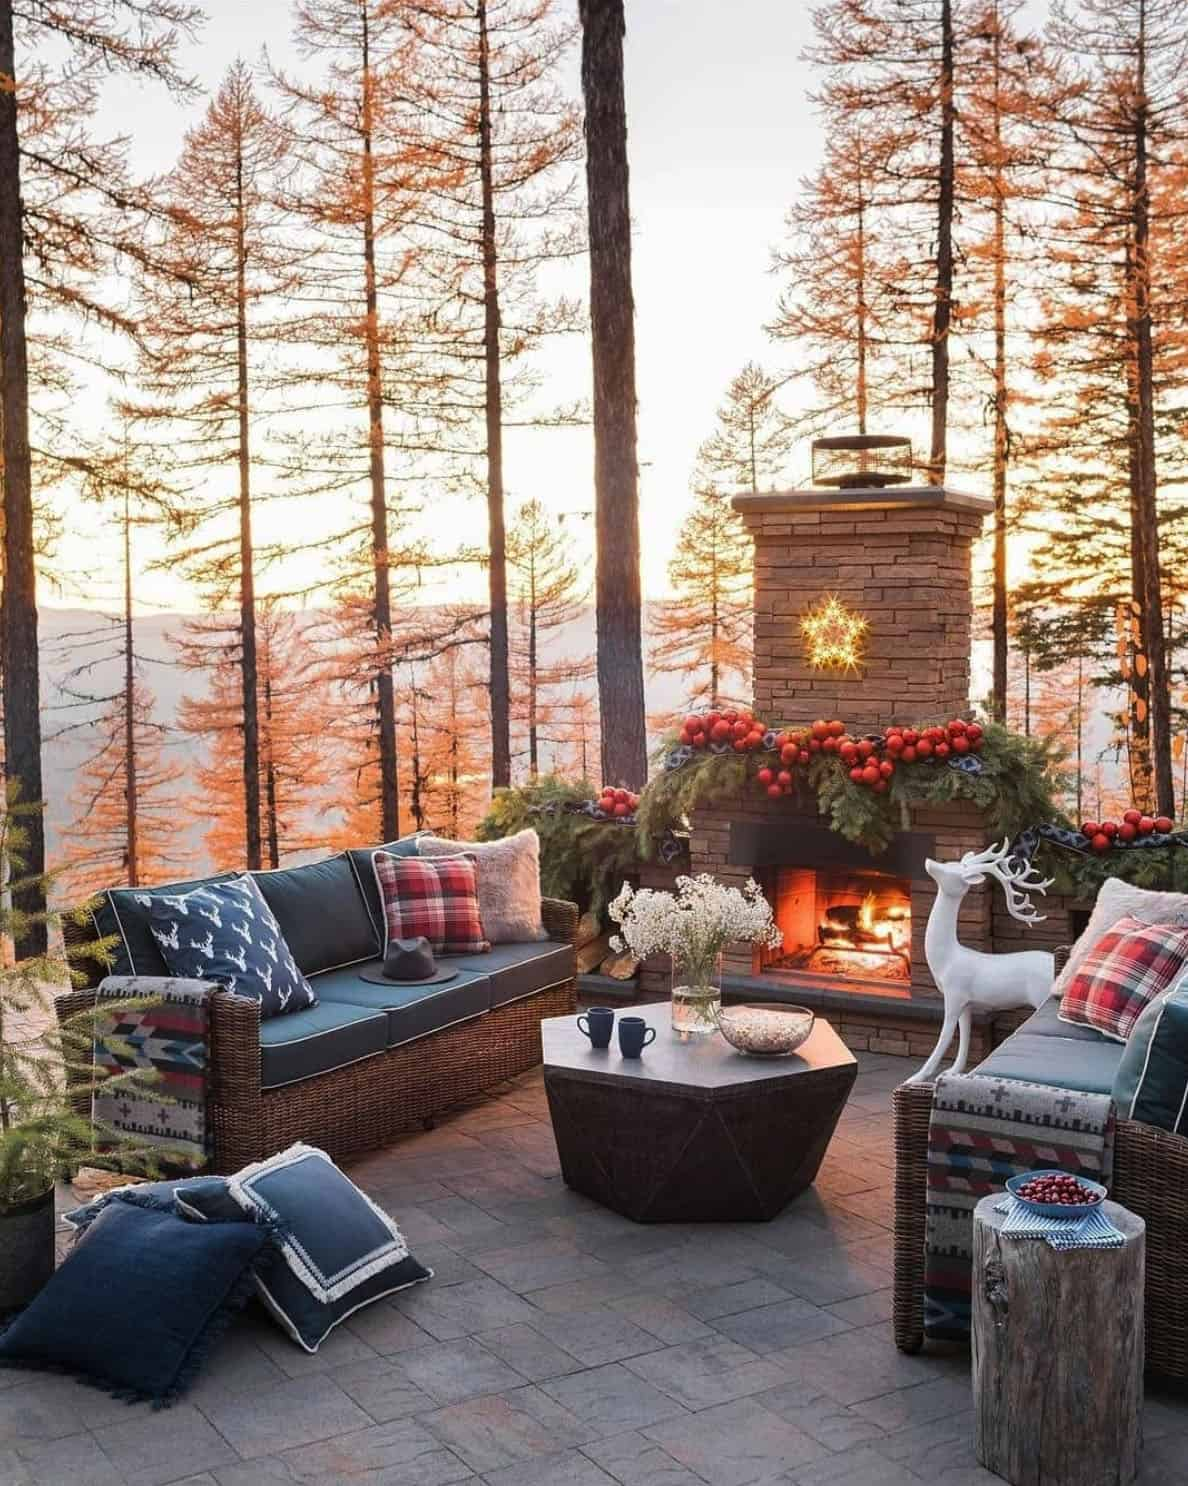 holiday-decor-ideas-outdoor-patio-fireplace